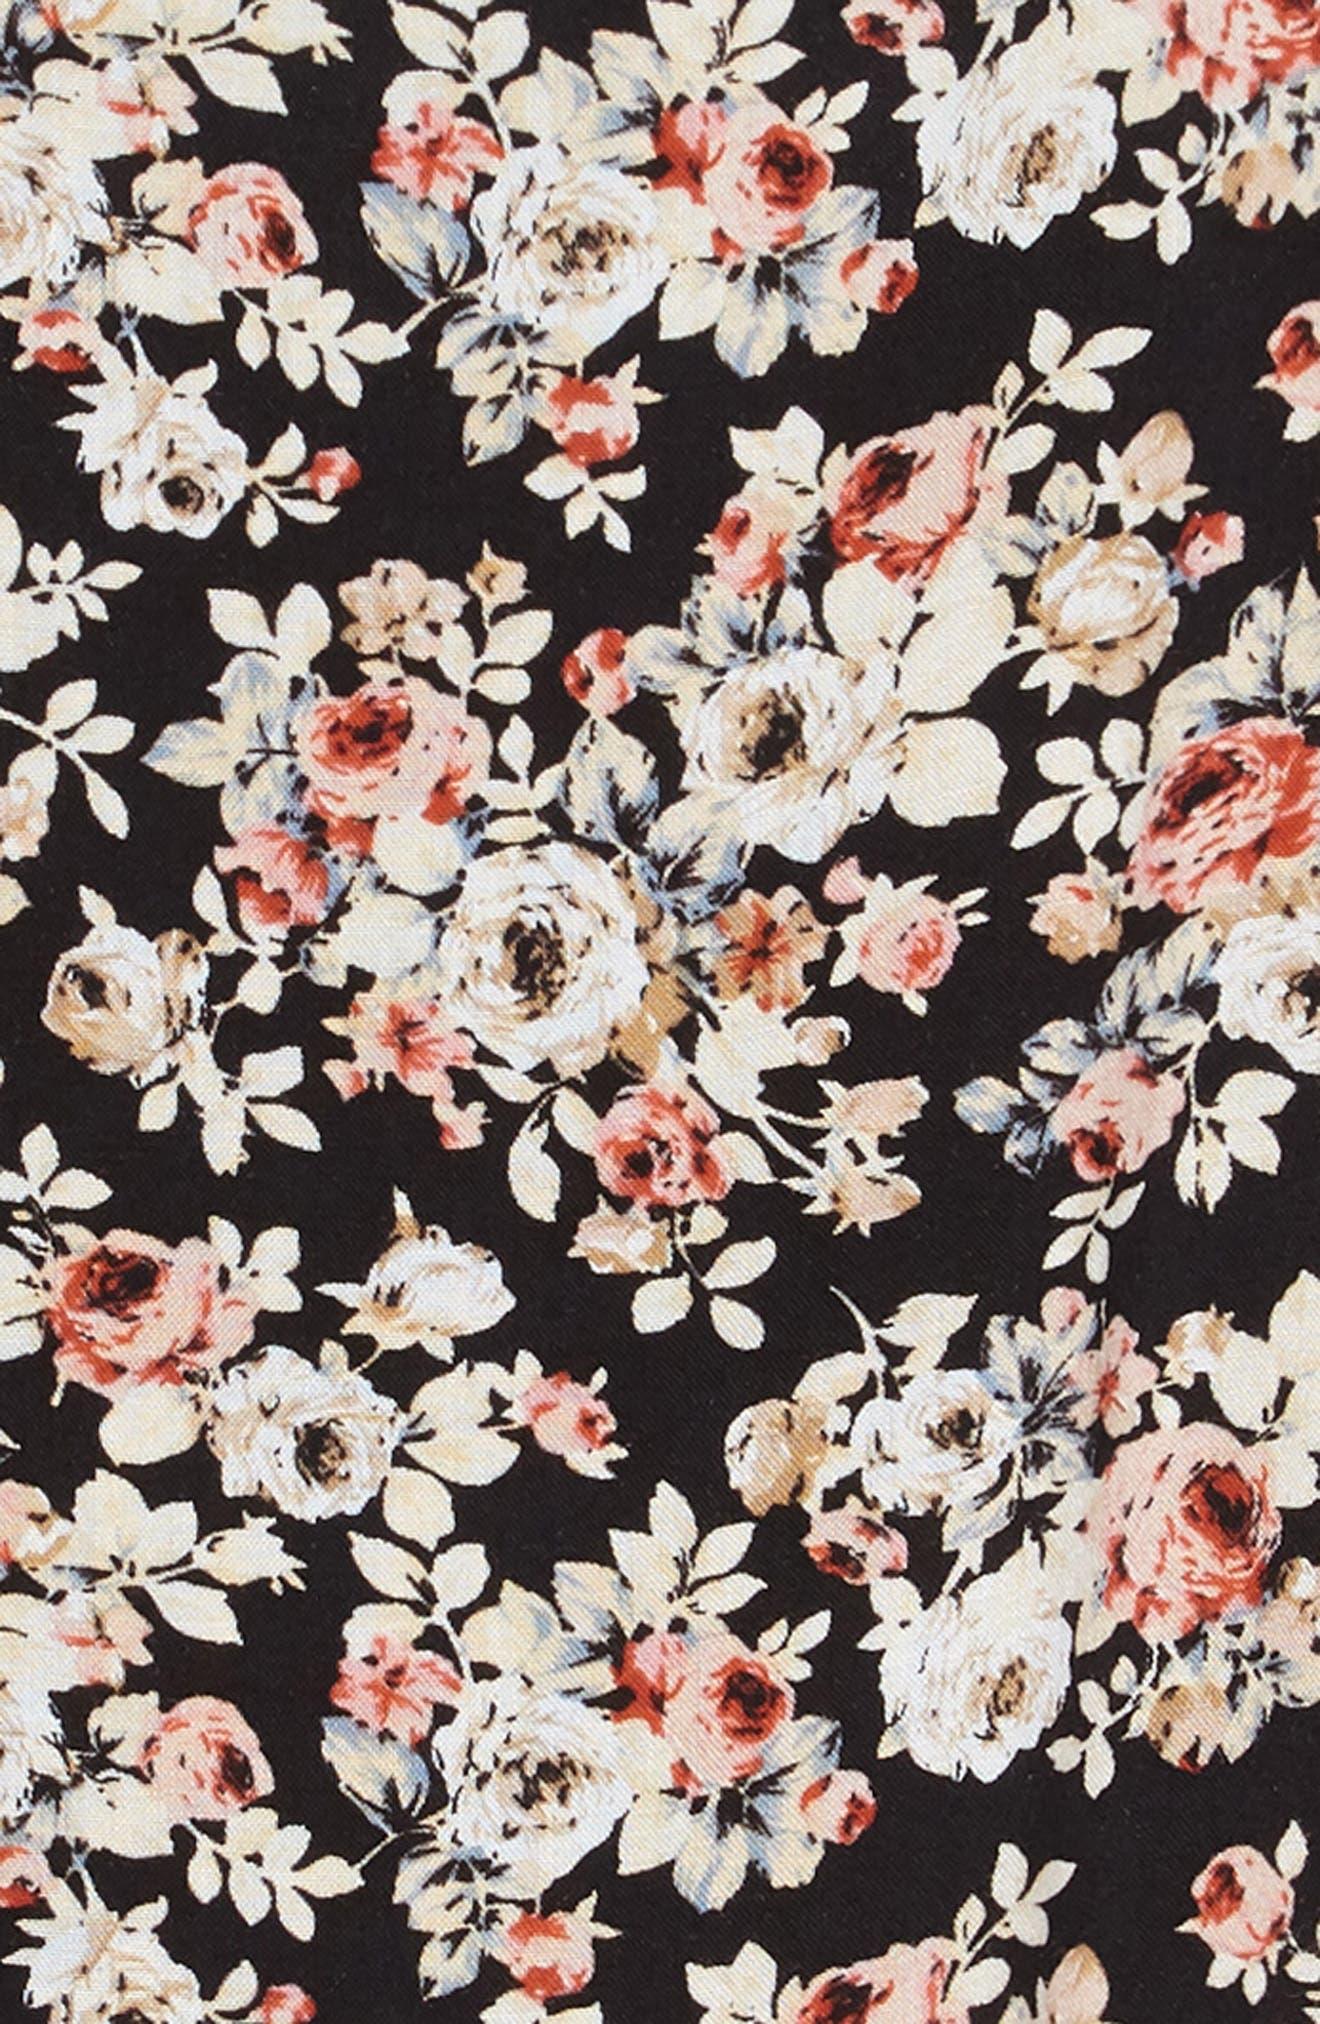 Floral Shift Dress,                             Alternate thumbnail 3, color,                             001